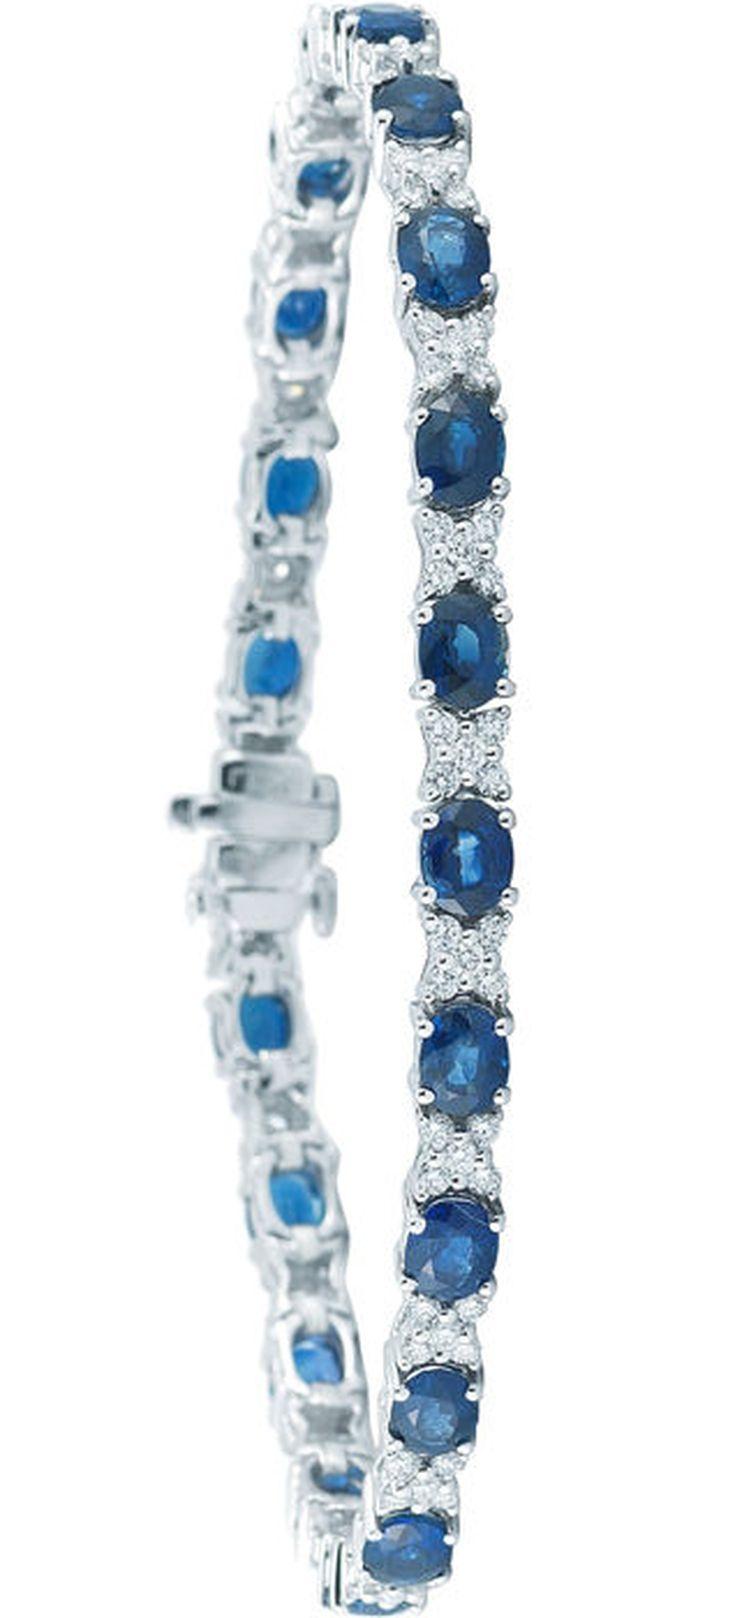 Costco Diamond Bracelet : costco, diamond, bracelet, Sapphire, Diamond, White, Bracelet, Bracelet,, Jewelry, Inspiration,